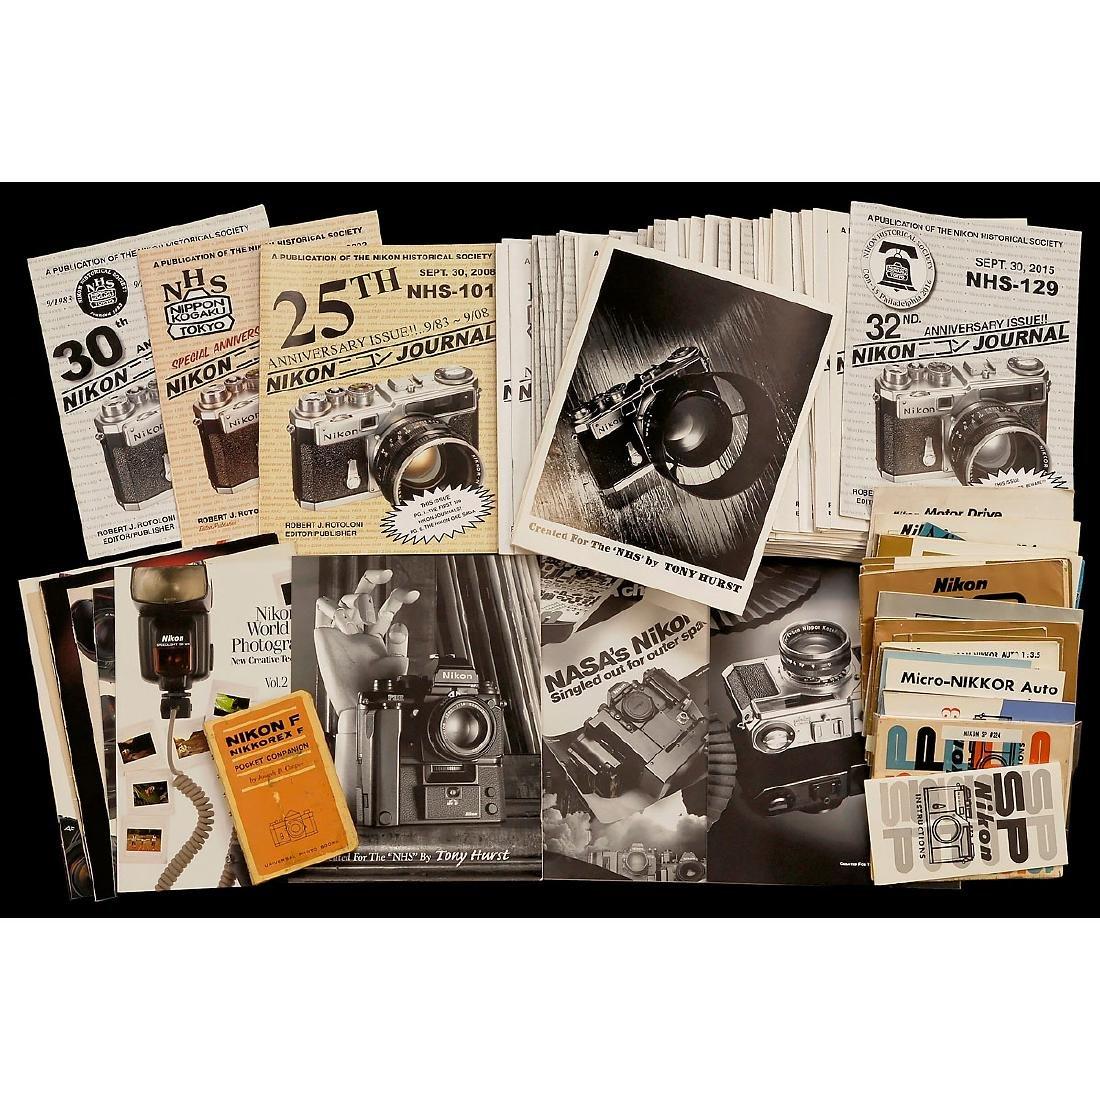 Nikon Literature and Instructions - 2